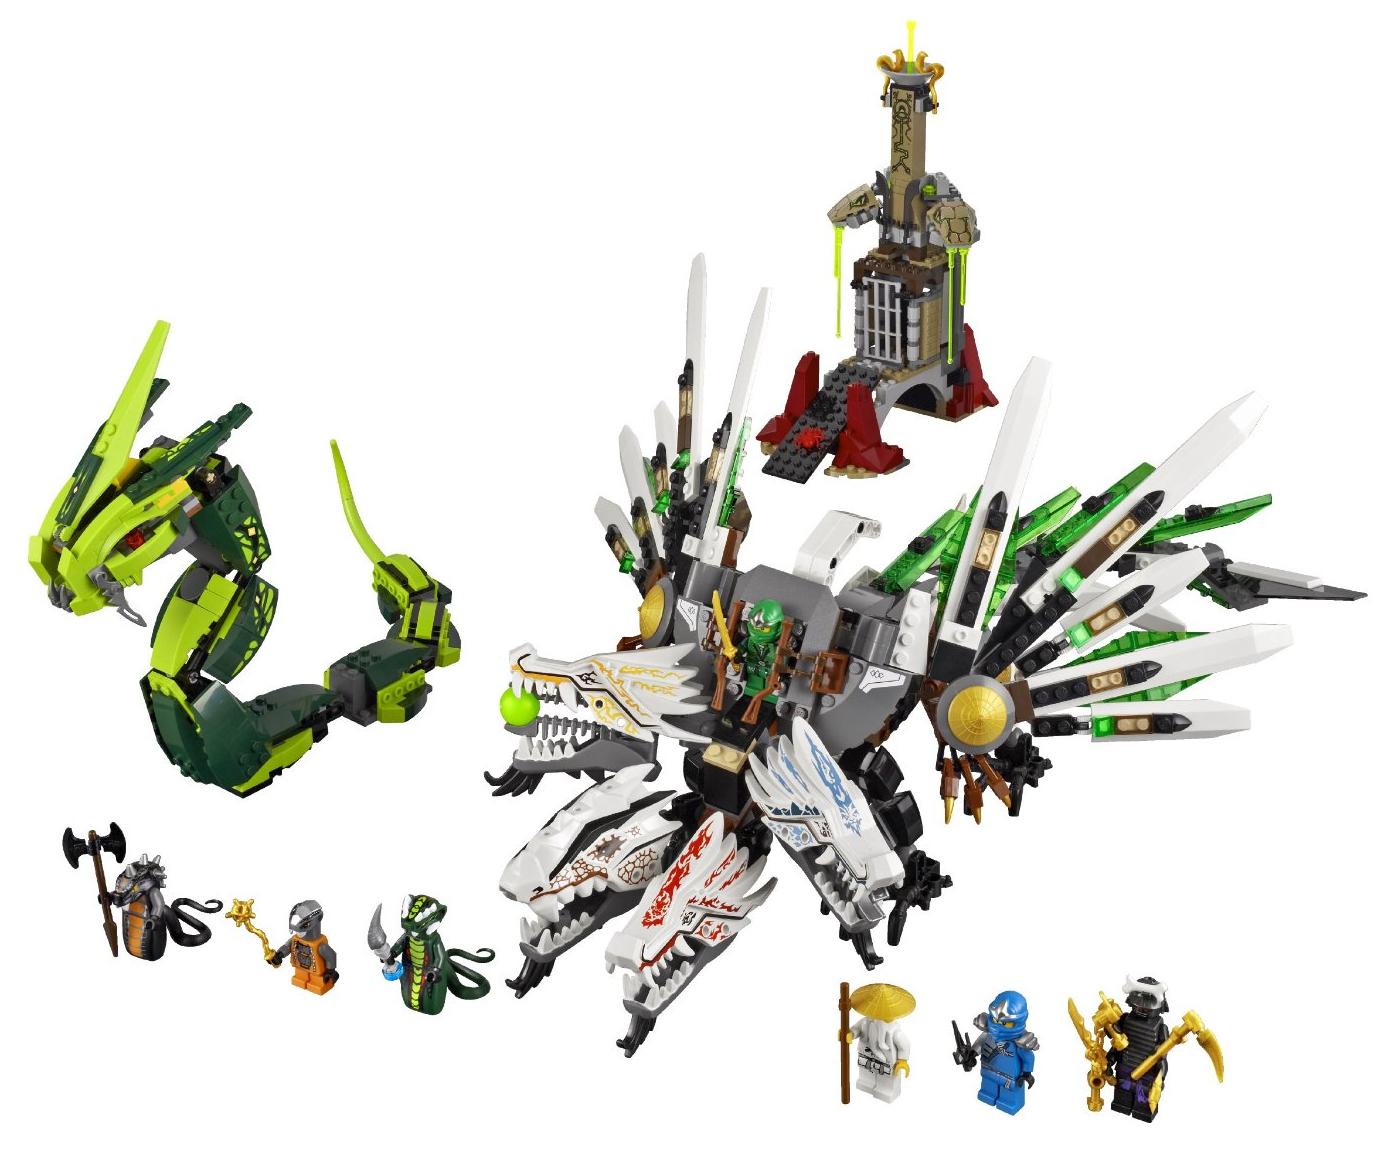 9450 Epic Dragon Battle Ninjago Wiki Fandom Powered By Wikia